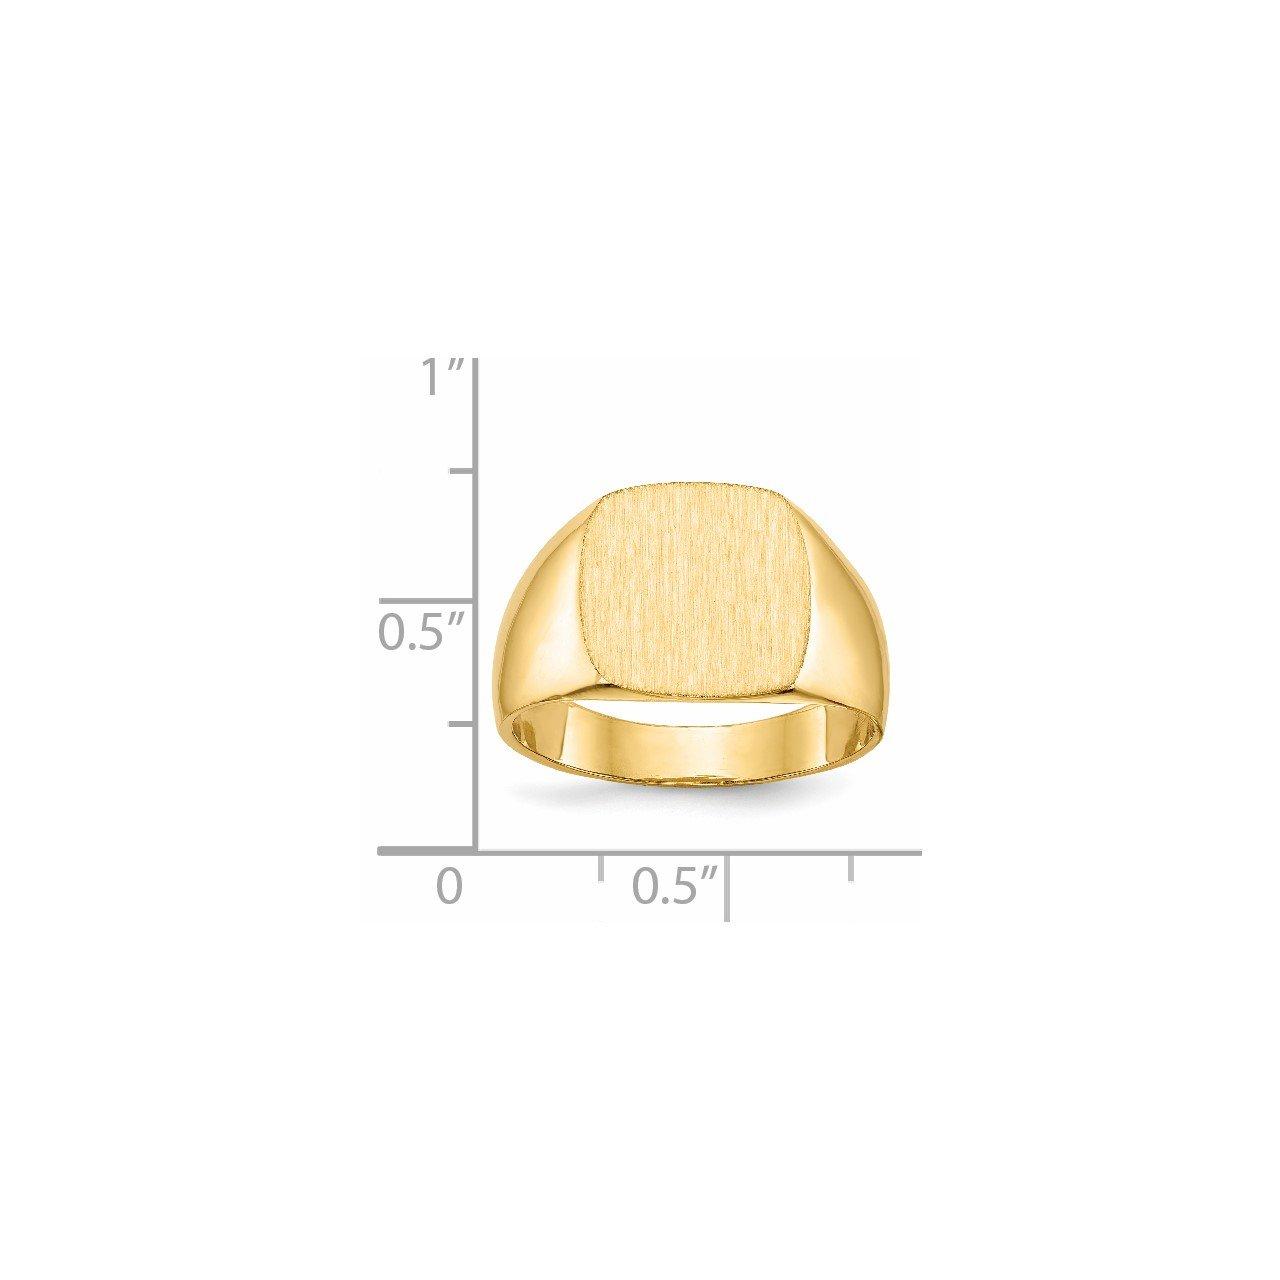 14k 12.0x13.0mm Closed Back Men's Signet Ring-4